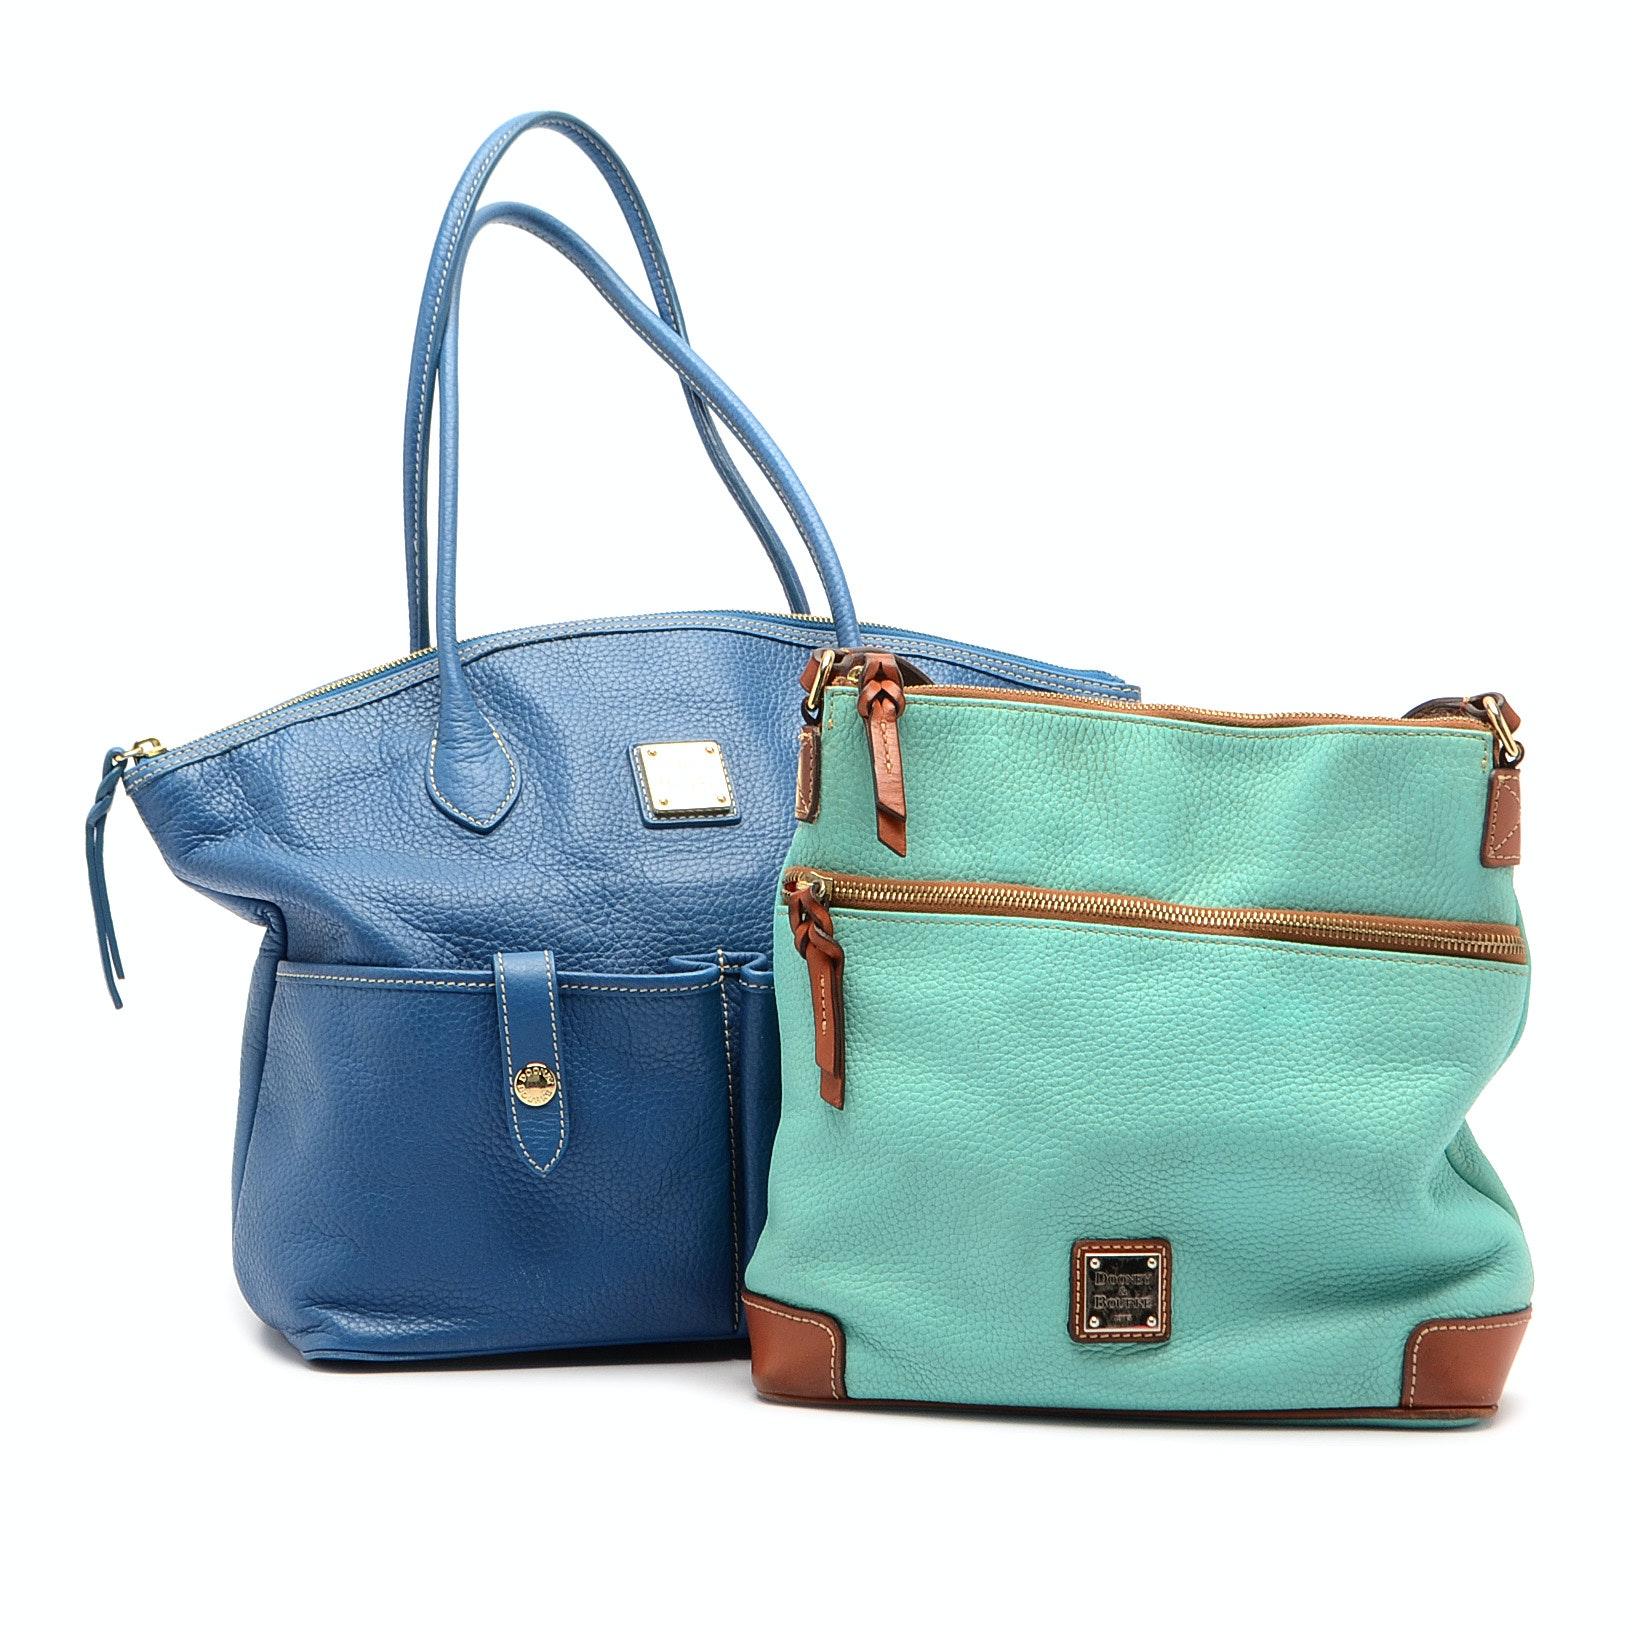 Dooney & Bourke Pebbled Leather Handbags